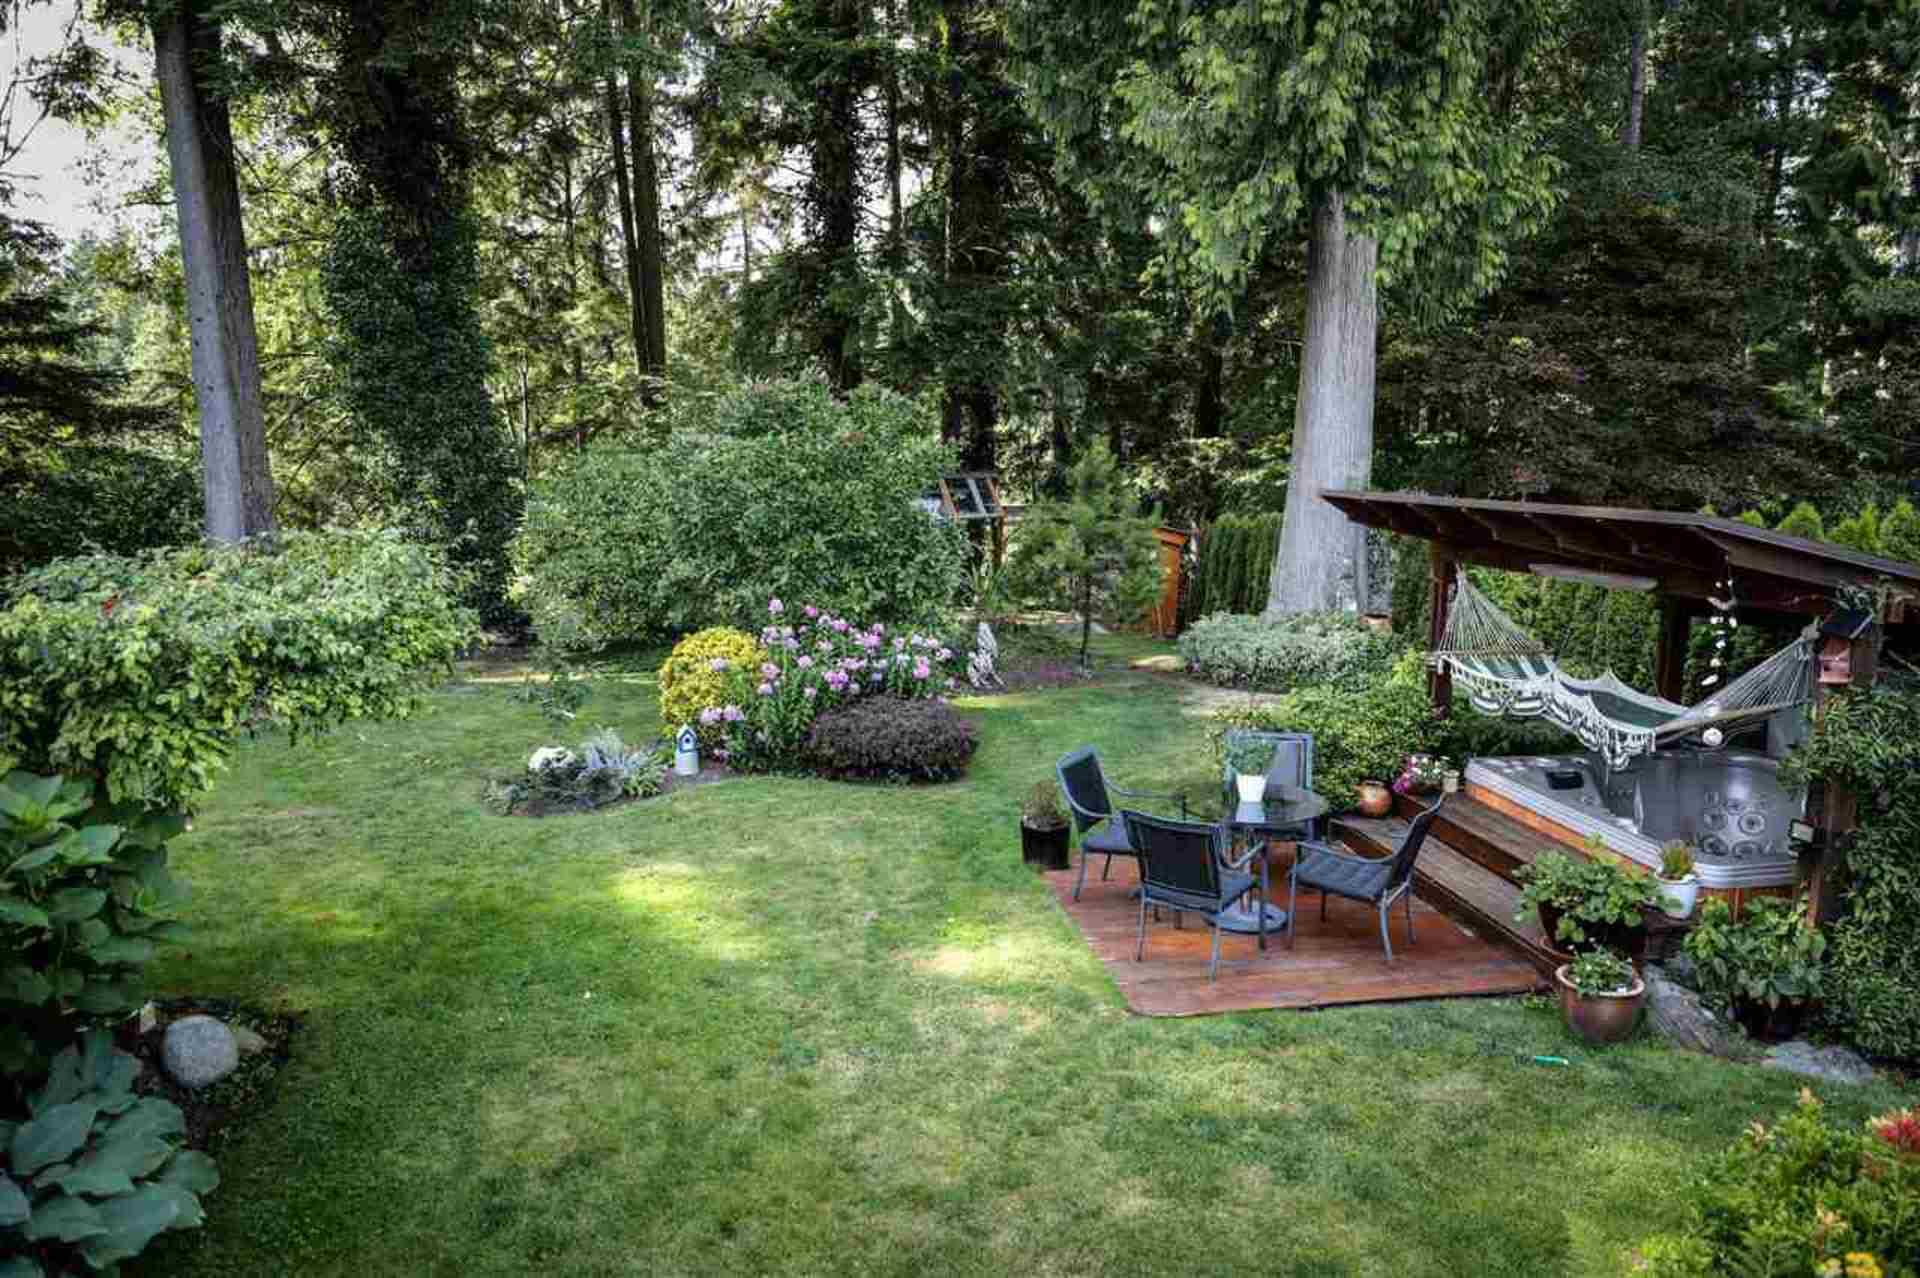 2491-kilmarnock-crescent-lynn-valley-north-vancouver-04 at 2491 Kilmarnock Crescent, Lynn Valley, North Vancouver